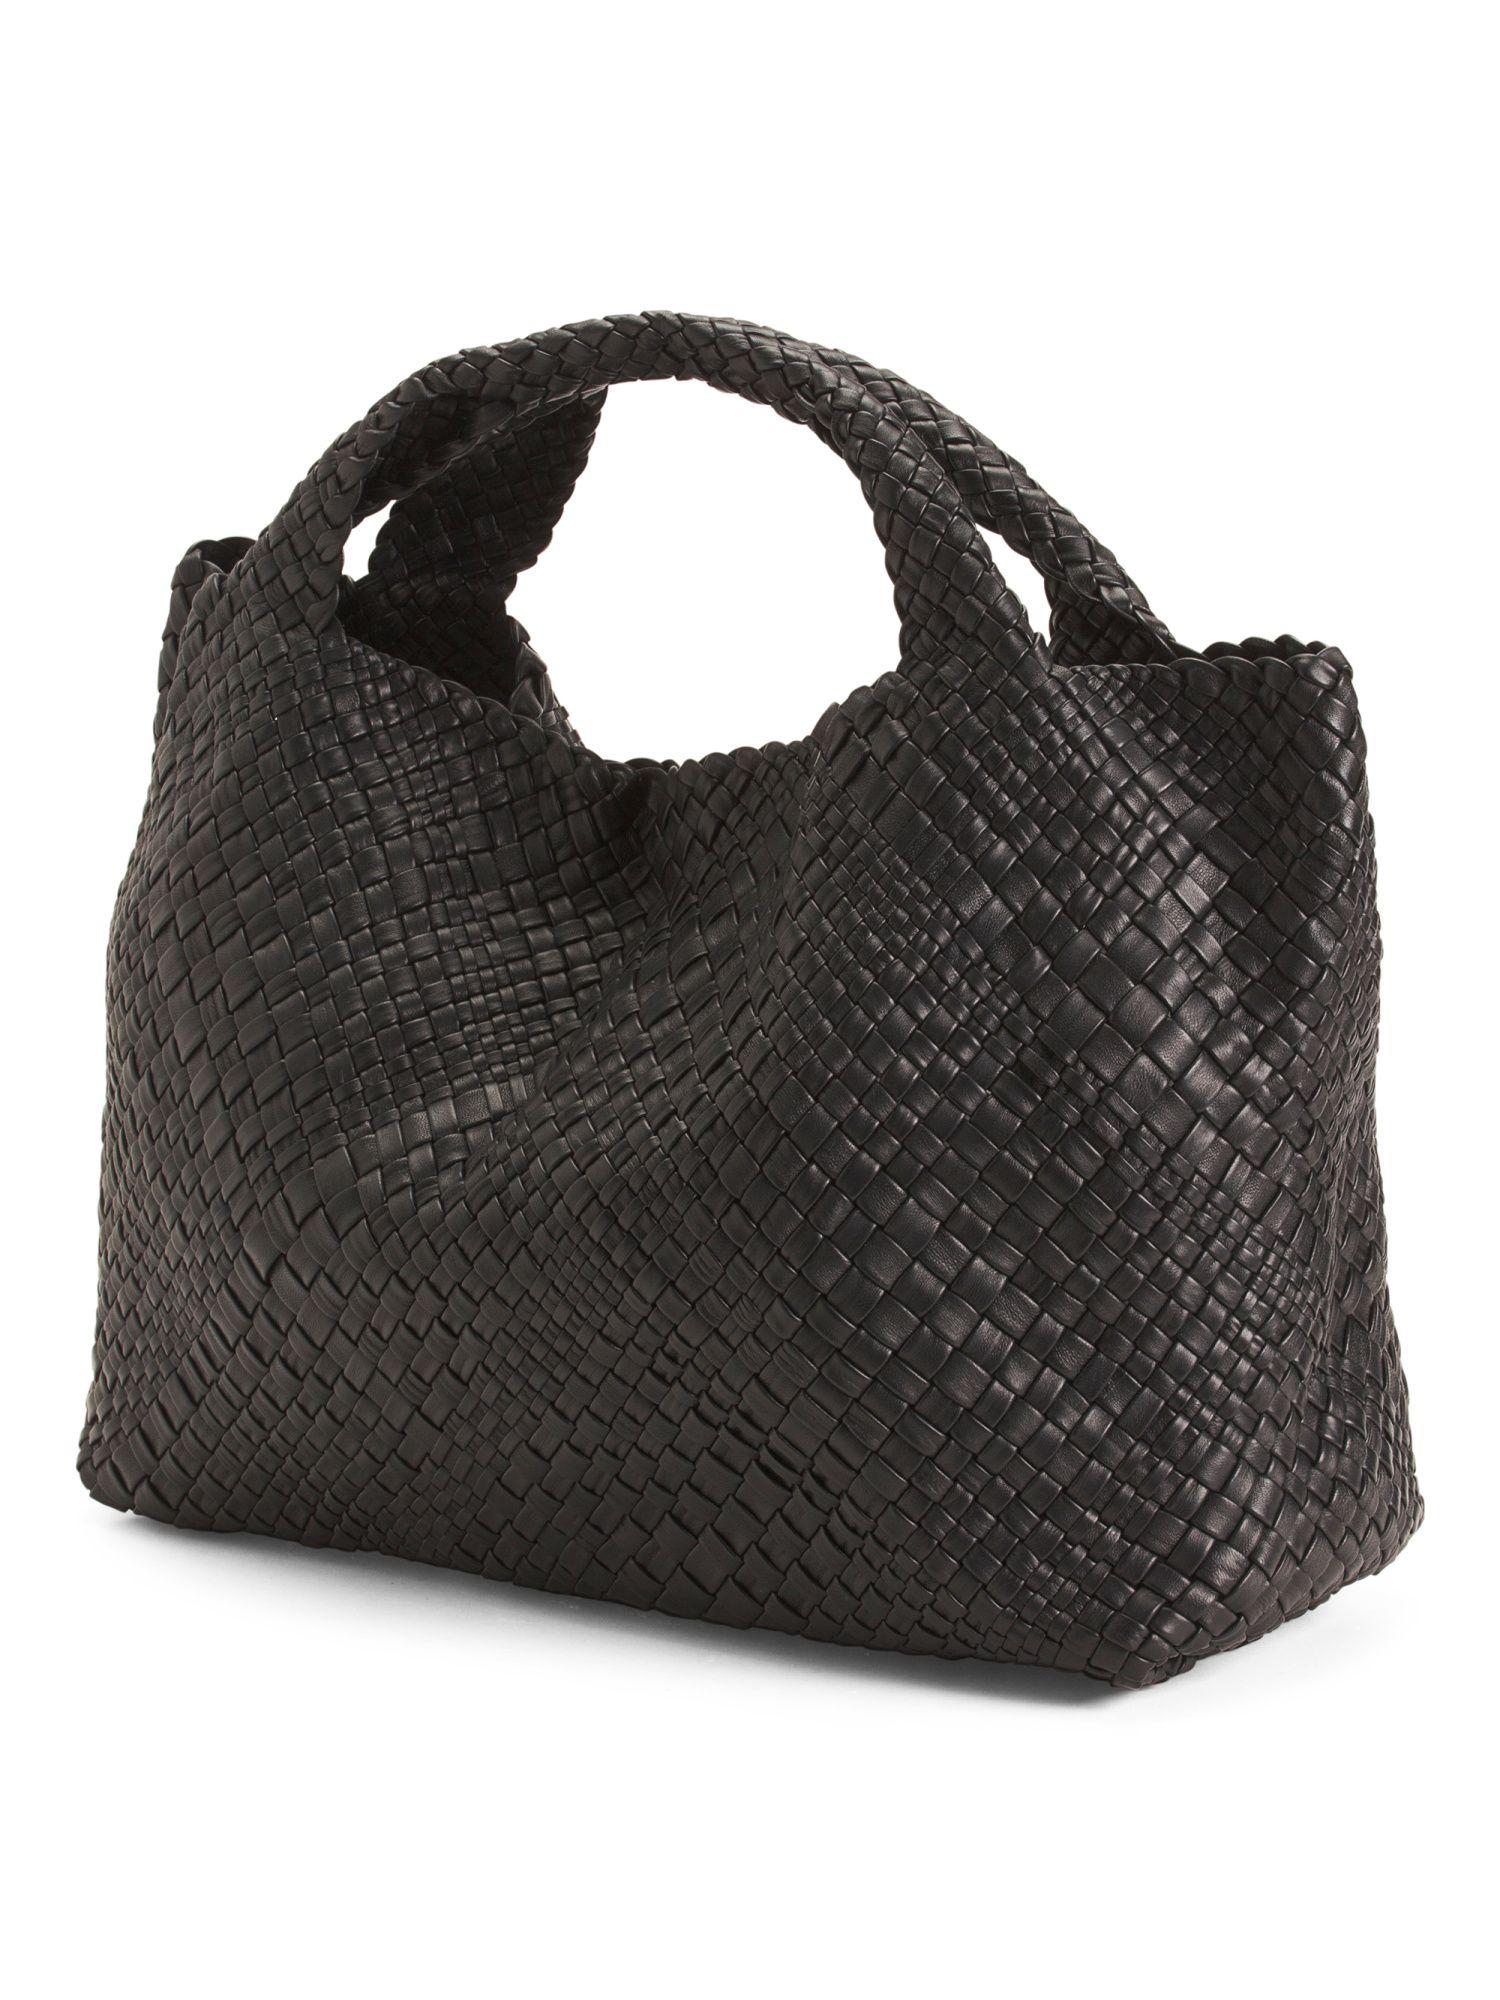 LADIES DESIGNER STYLE WOVEN BASKET BAG BOX TOP HANDBAG TOTE HOBO RETRO SHOPPER